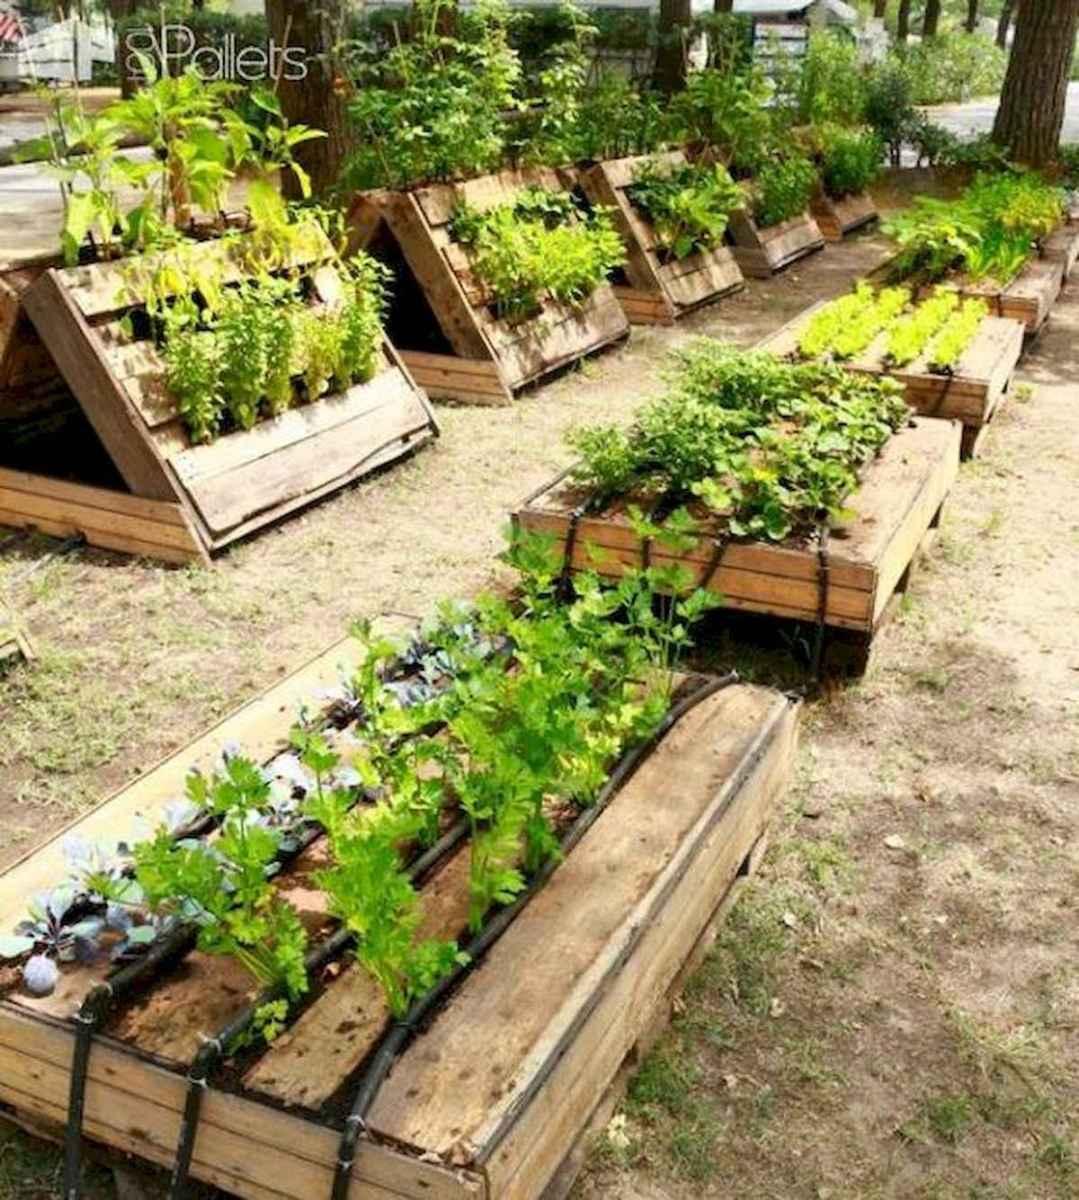 50 Inspiring Diy Projects Pallet Garden Design Ideas Coachdecor Com